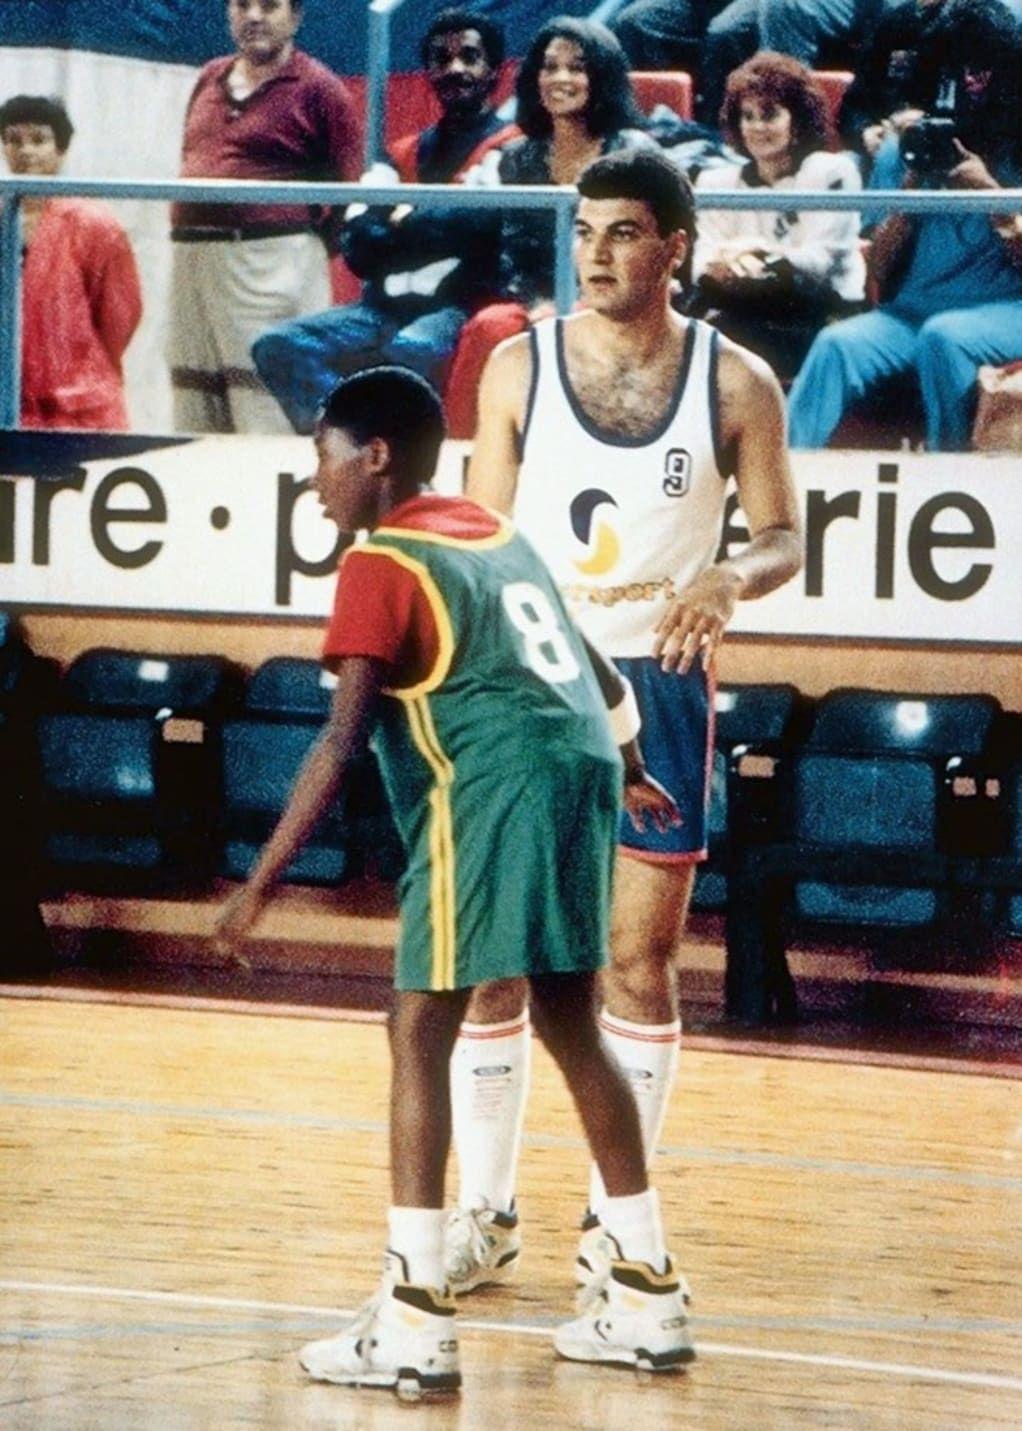 Rare Photos of Kobe Bryant in 2020